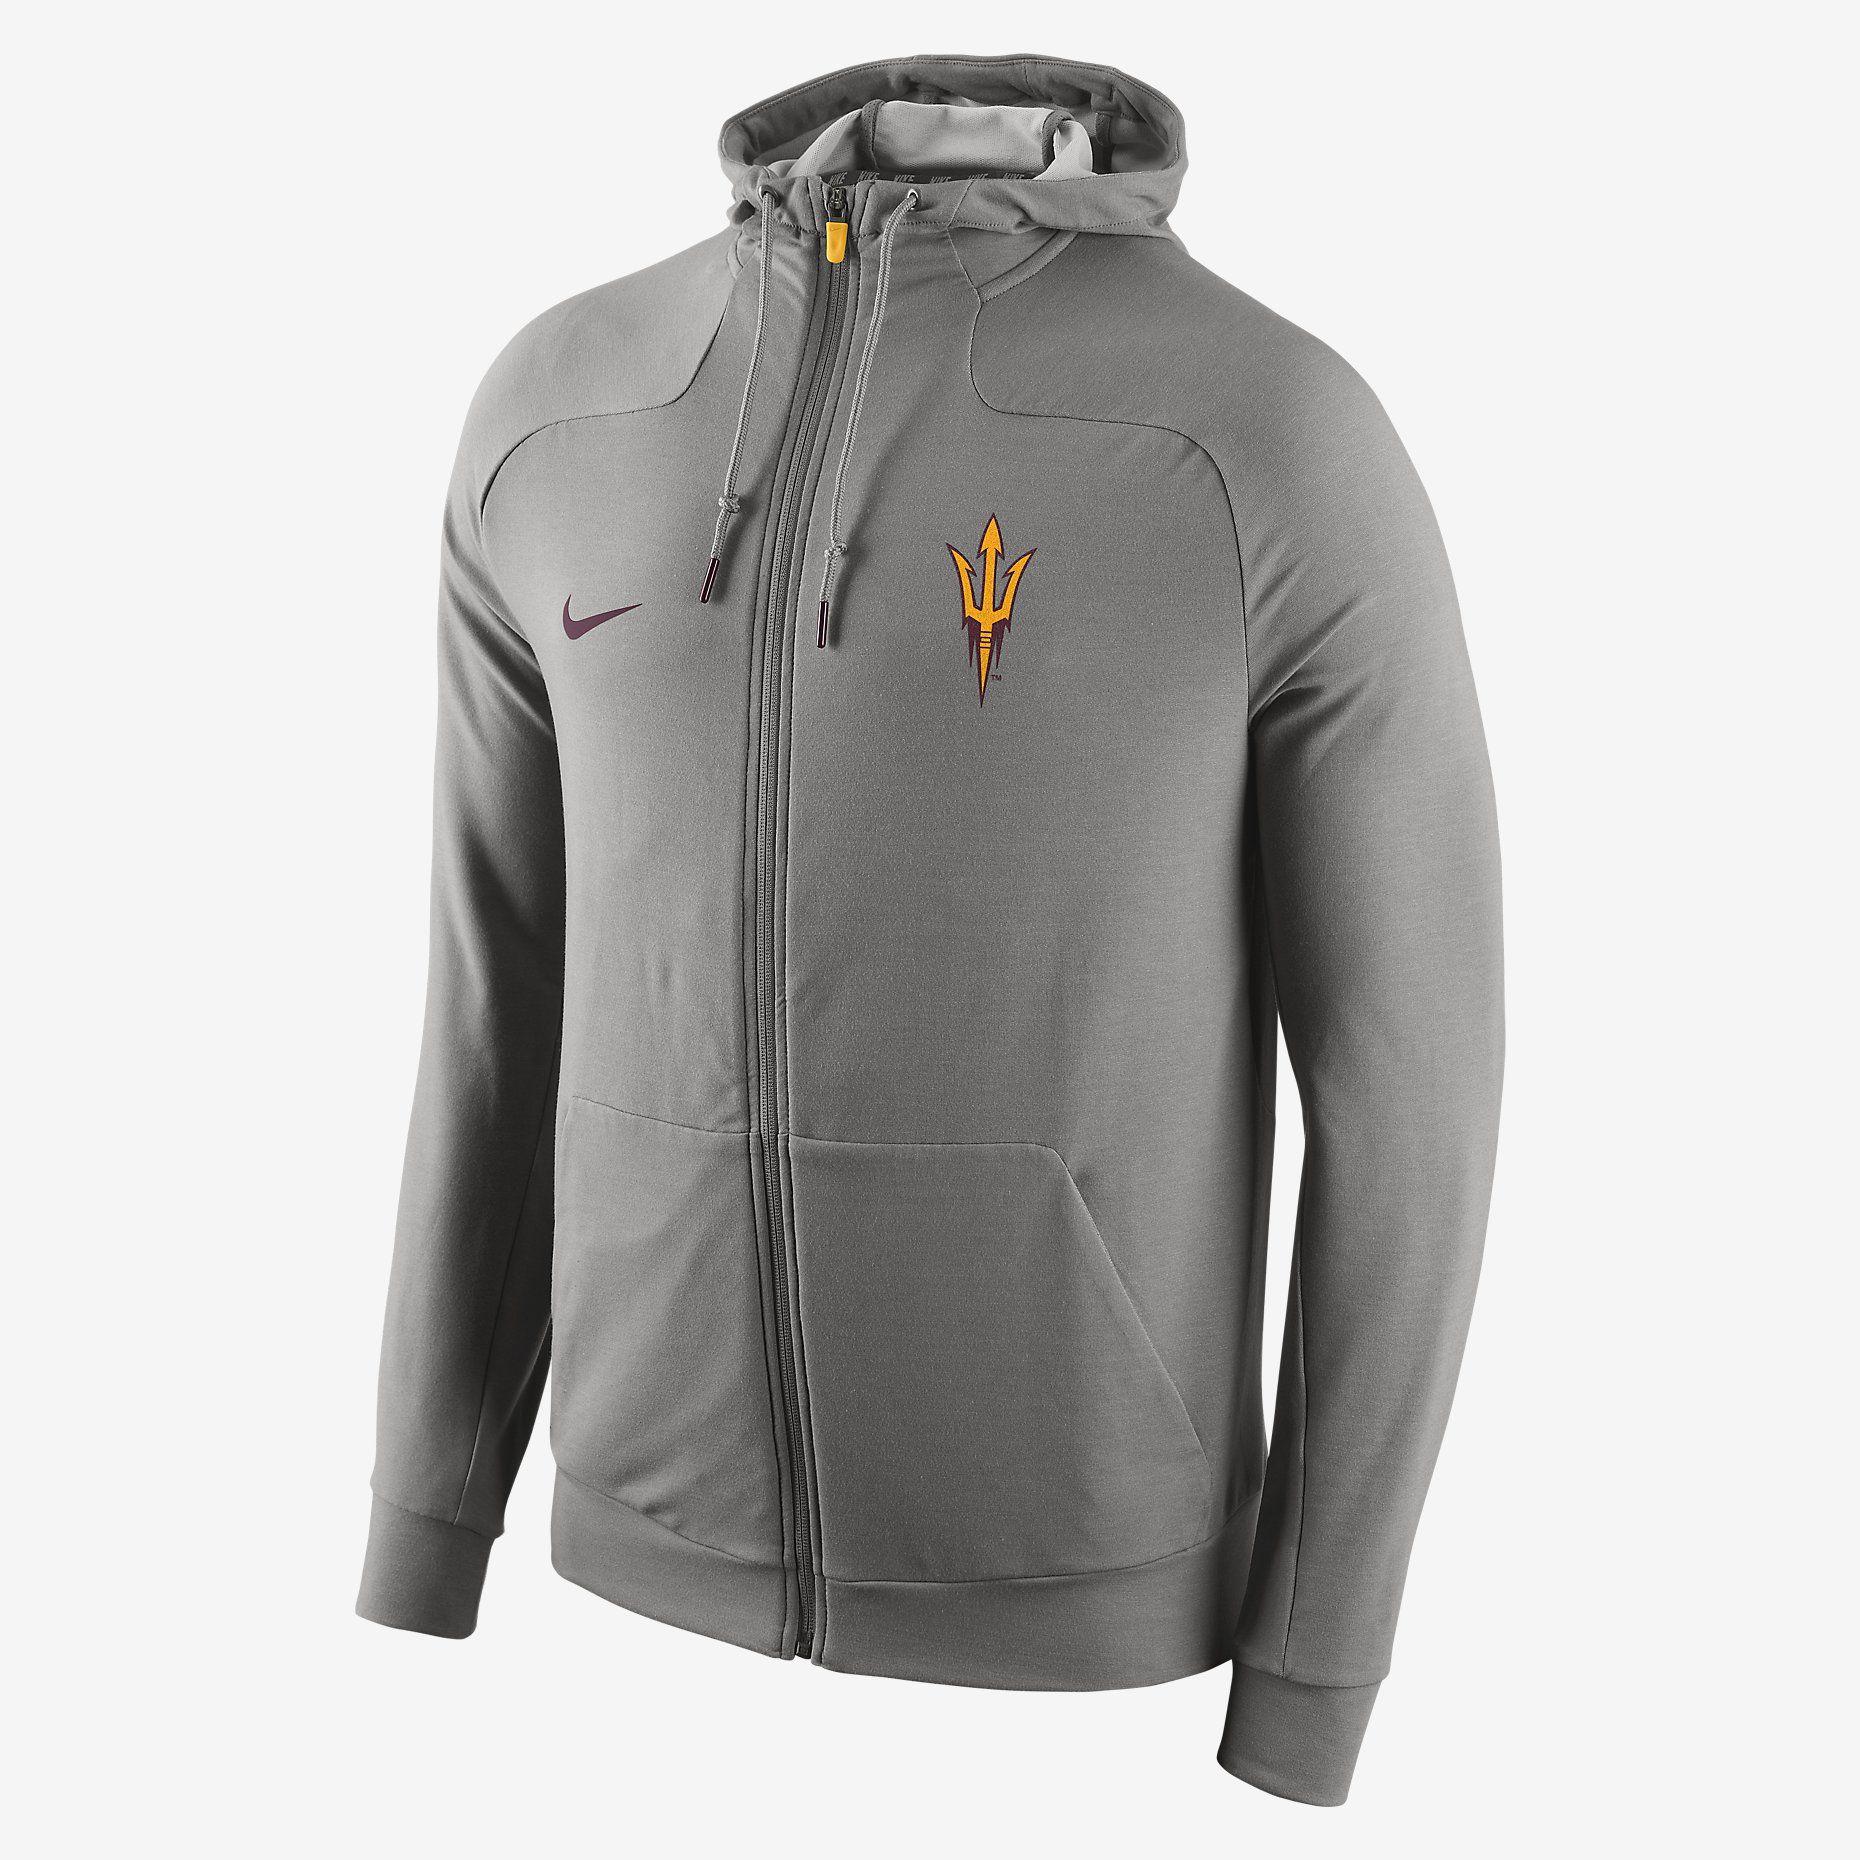 8adcb3f8 Nike Supernatural Full-Zip (Arizona State) Men's Hoodie. Nike Store ...